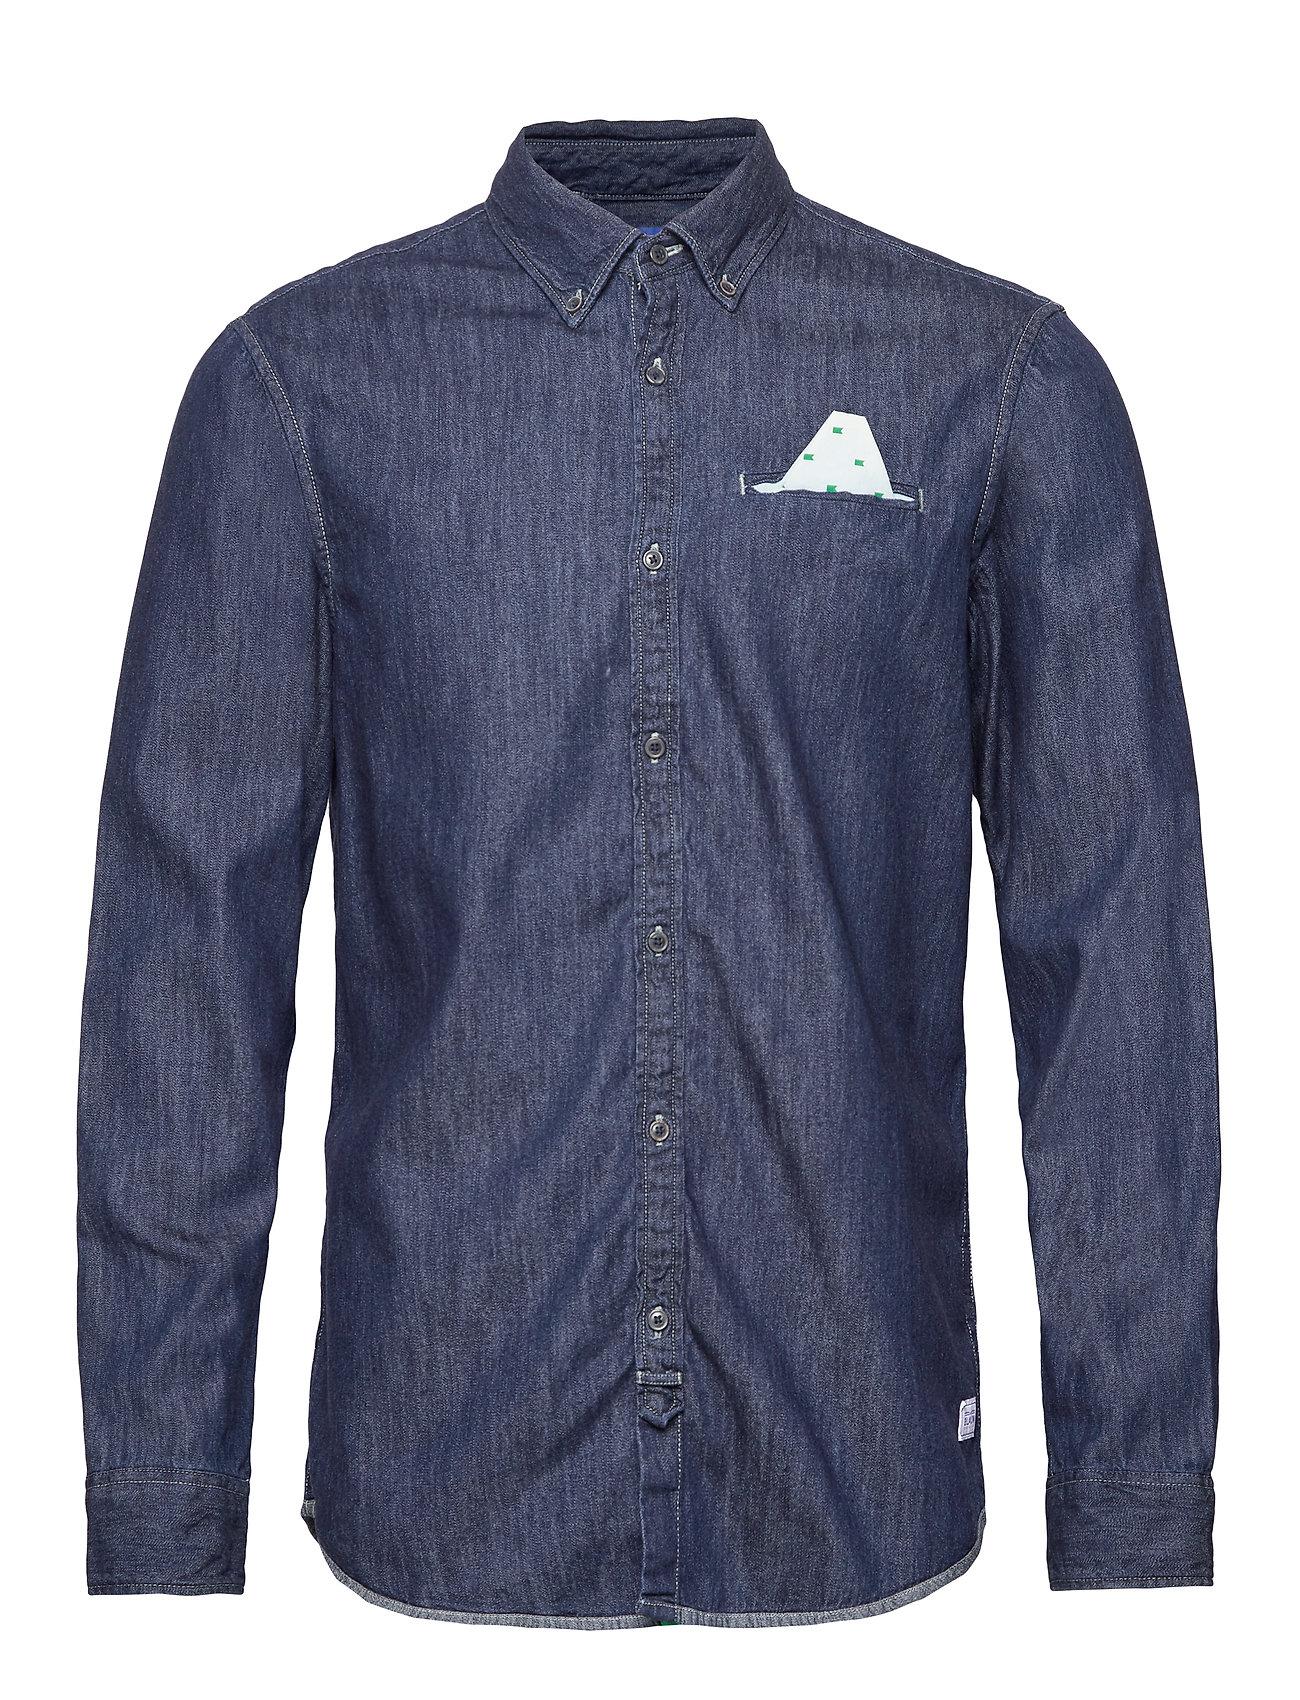 Scotch & Soda Ams Blauw regular fit denim shirt with pochet pocket detail - INDIGO BLUE